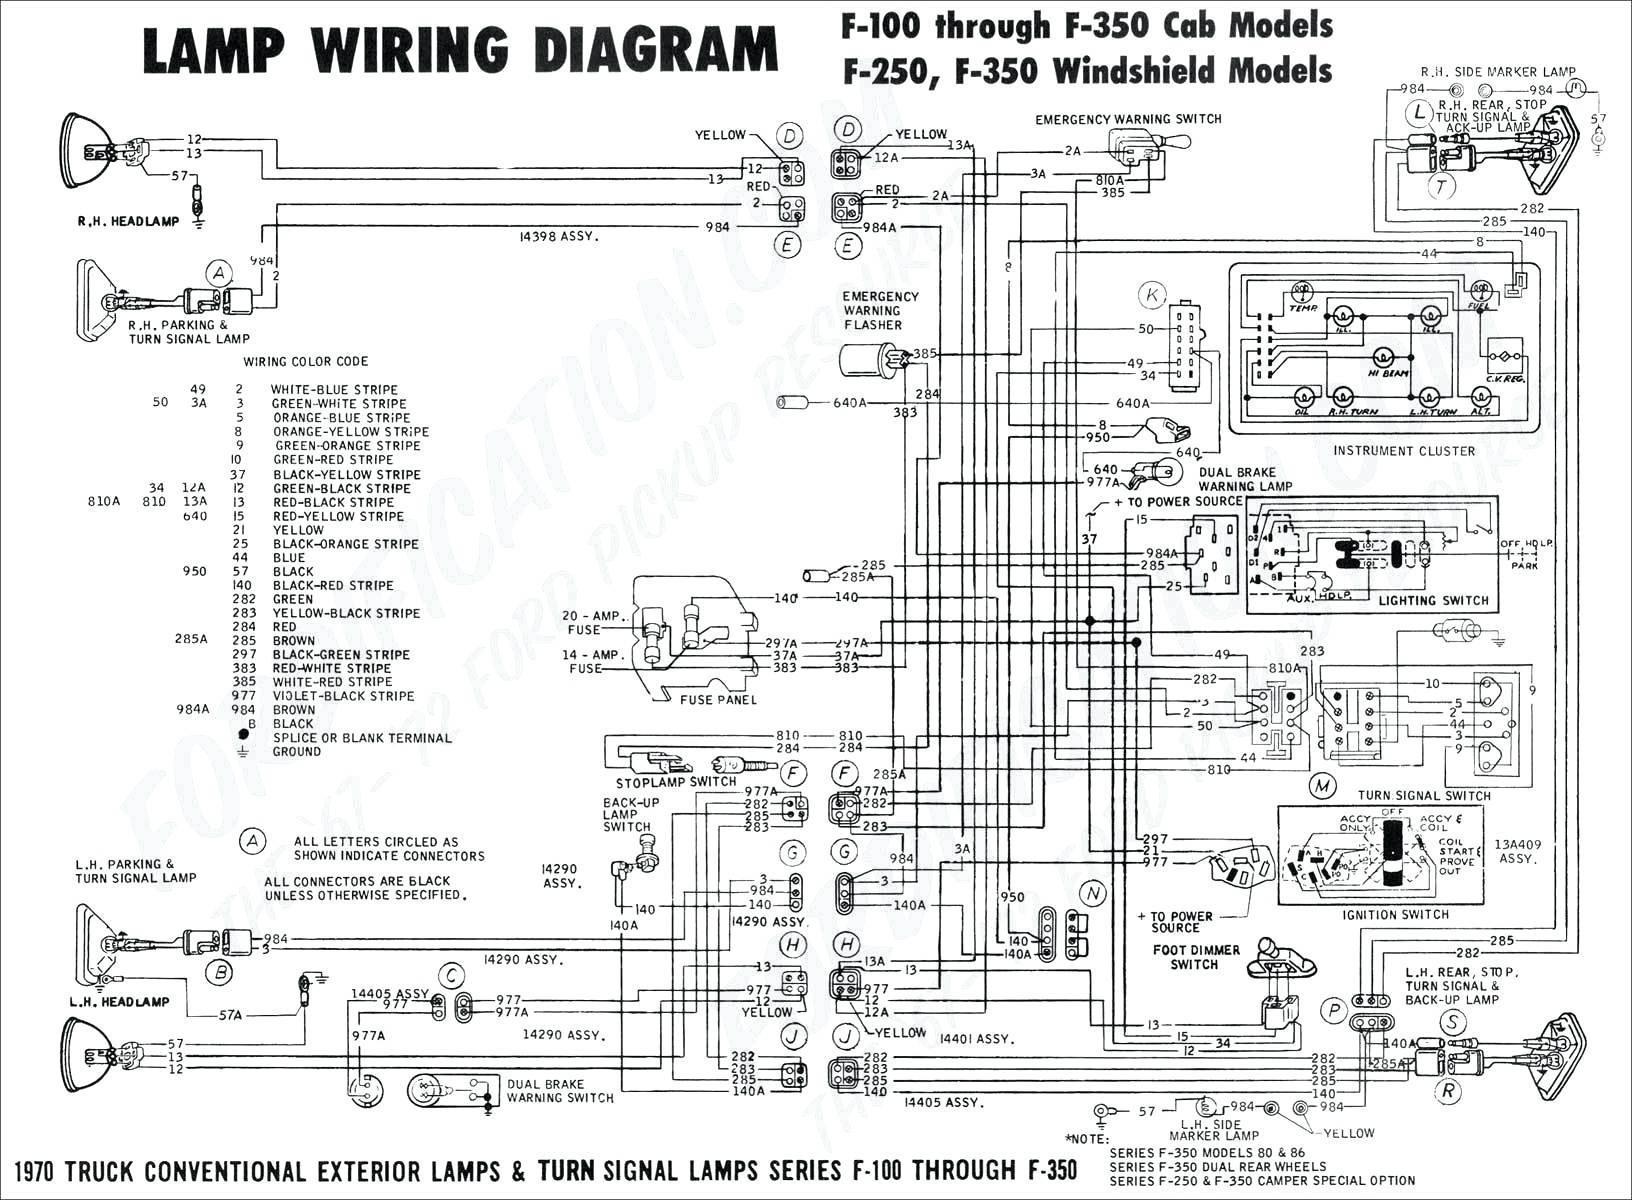 VV_4132] Dodge Dart Radio Wiring Diagram Schematic Wiring | 2013 Dodge Dart Radio Wiring Diagram |  | Adit Itive Kapemie Aesth Jidig Isra Mohammedshrine Librar Wiring 101